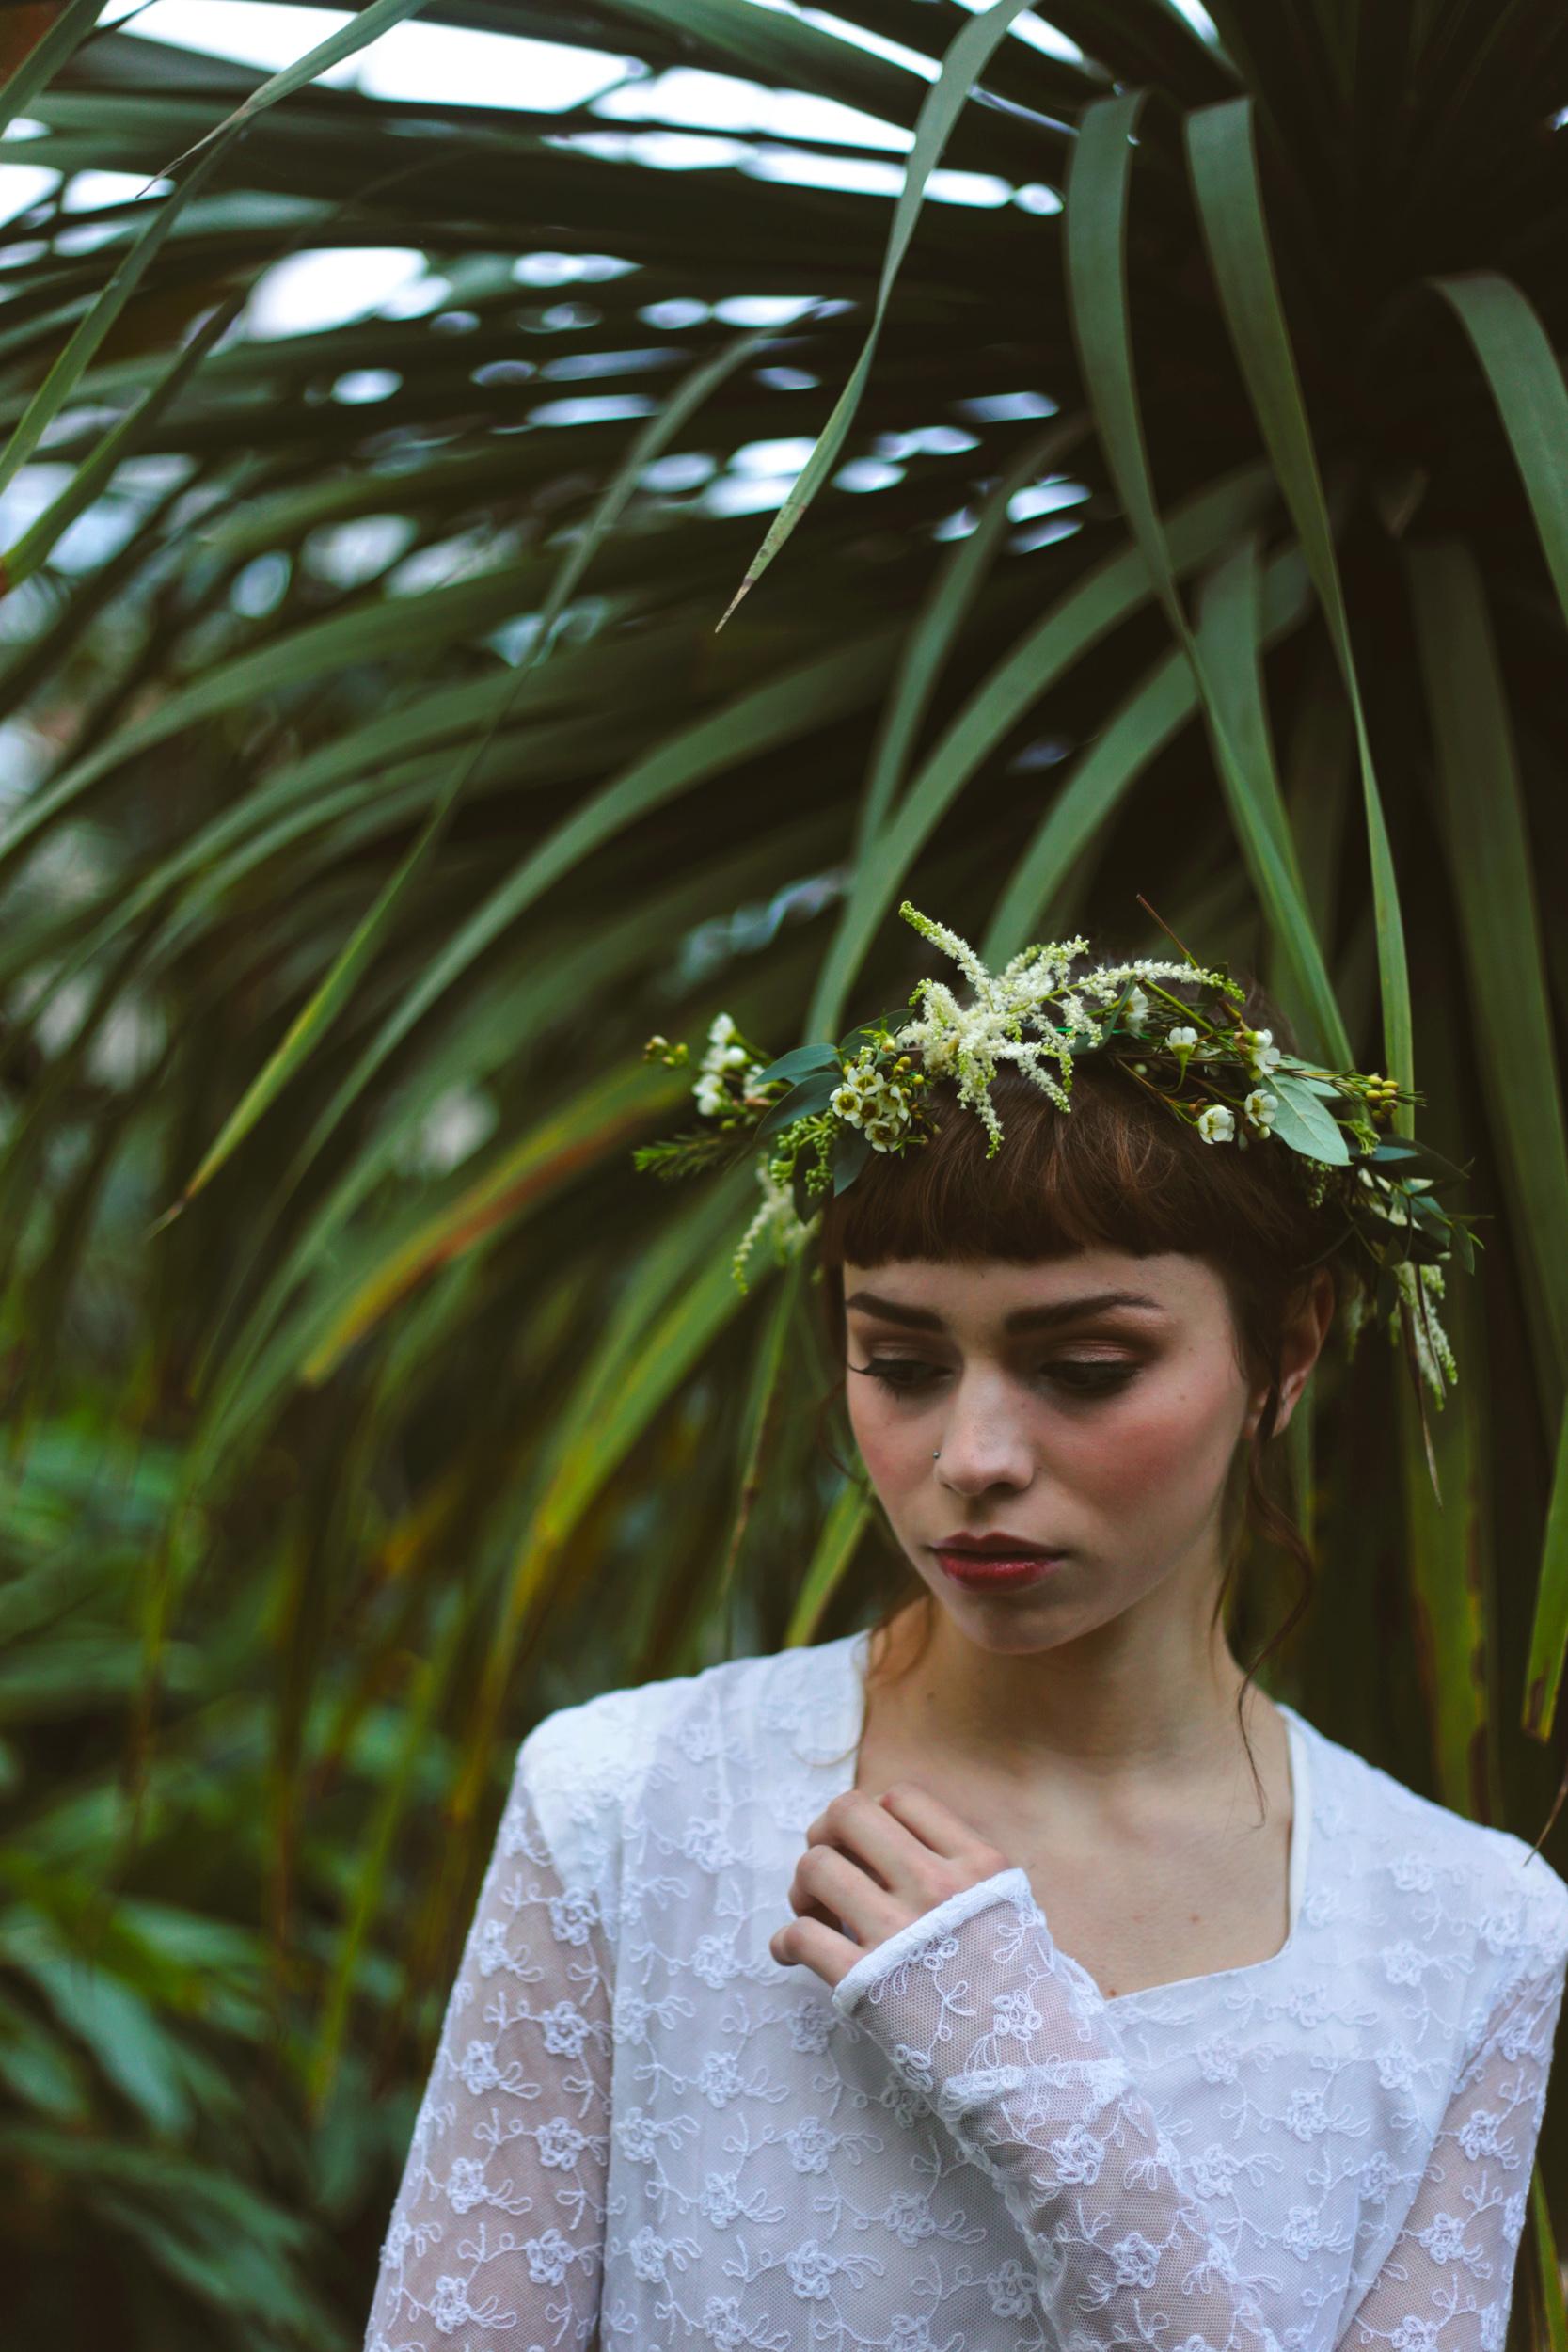 Winter-Bridal-Kate-Beaumont-Shelley-Richmond-Vintage-Wedding-Dress-25.jpg